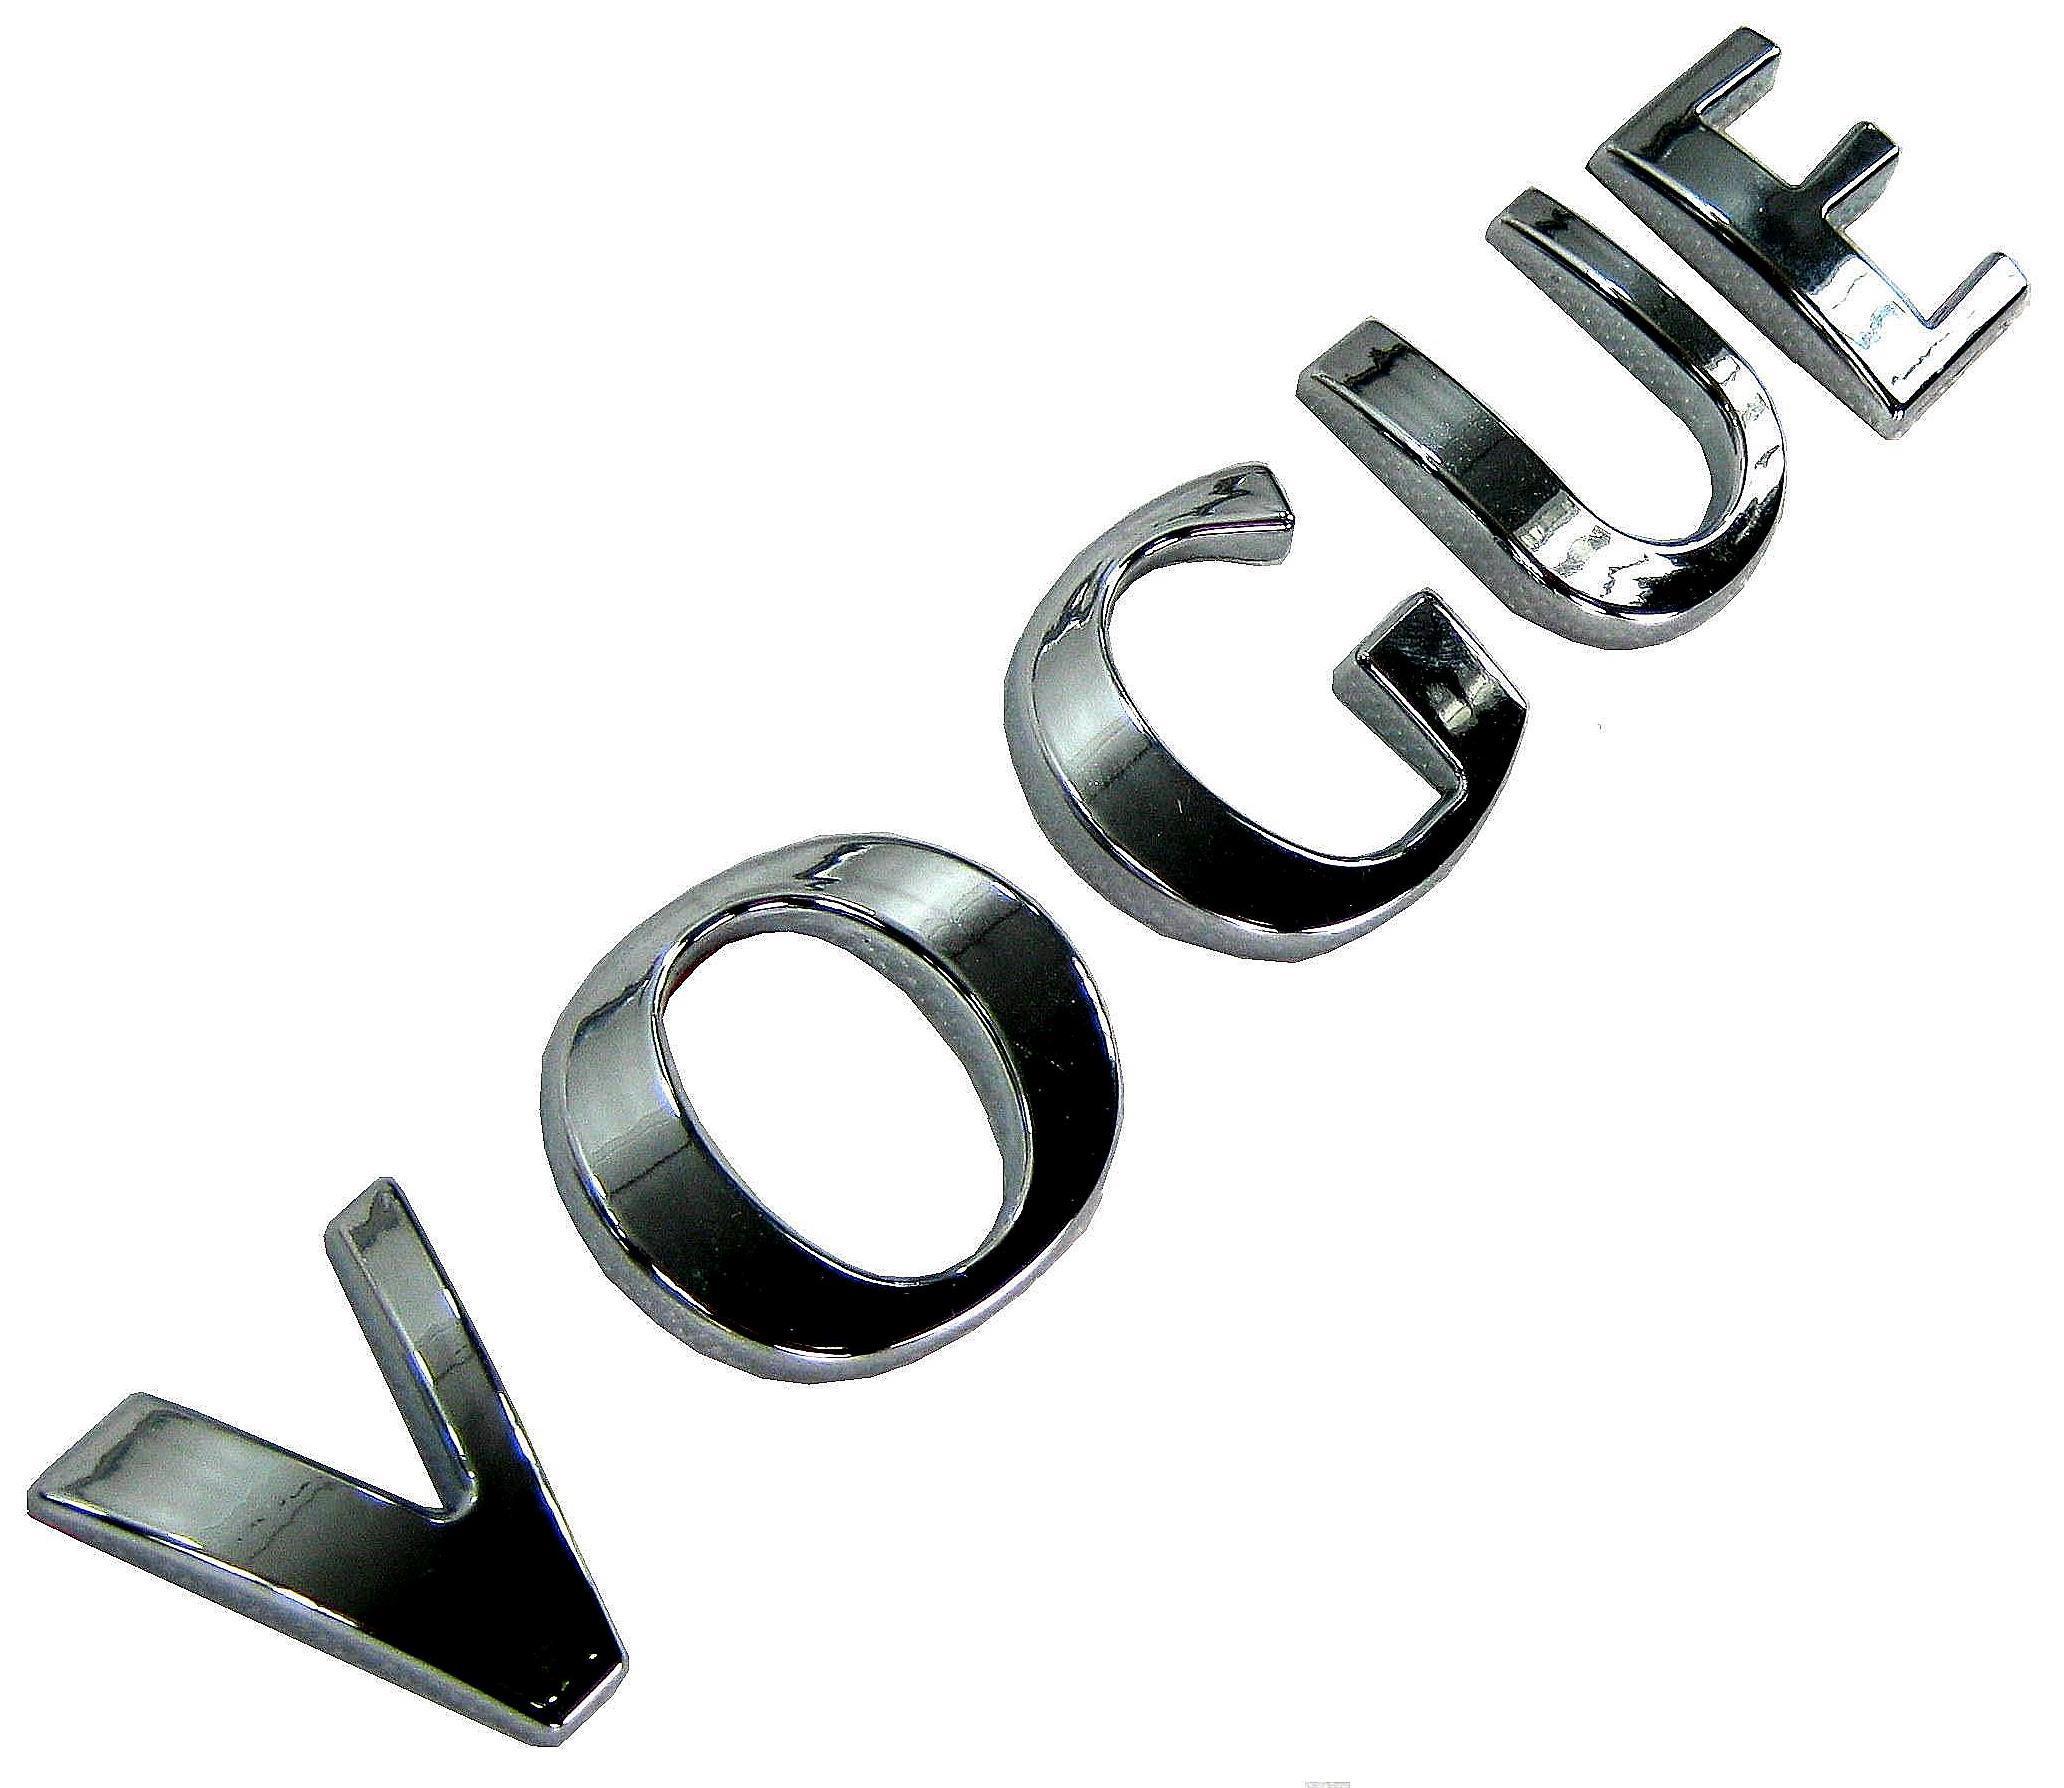 range rover logo vector. item specifics range rover logo vector